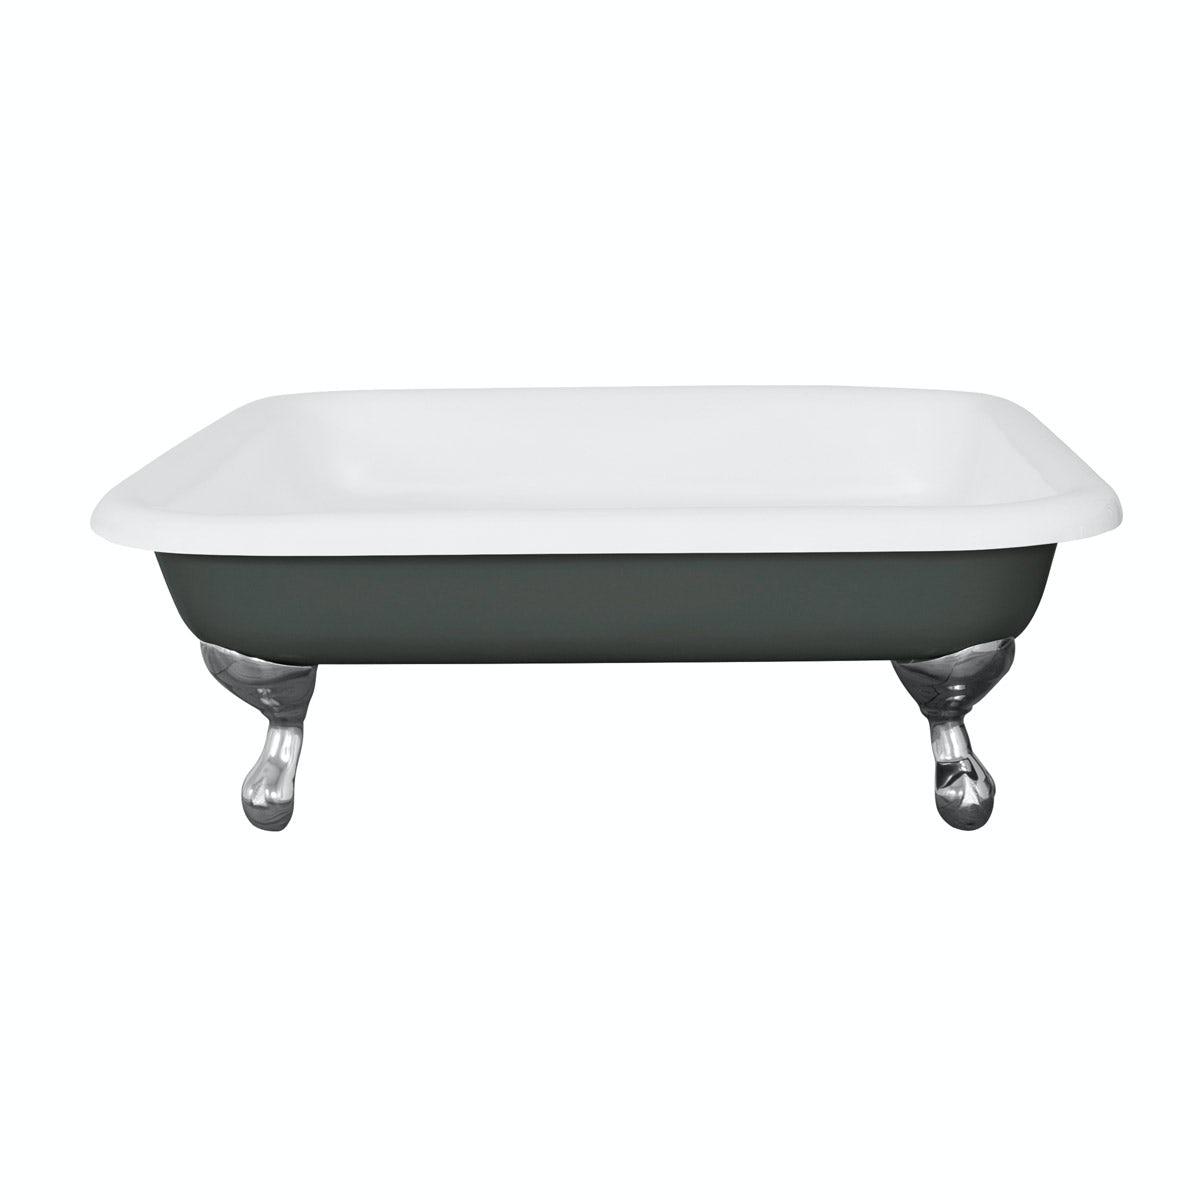 The Bath Co. Lewes smoke grey cast iron shower tray